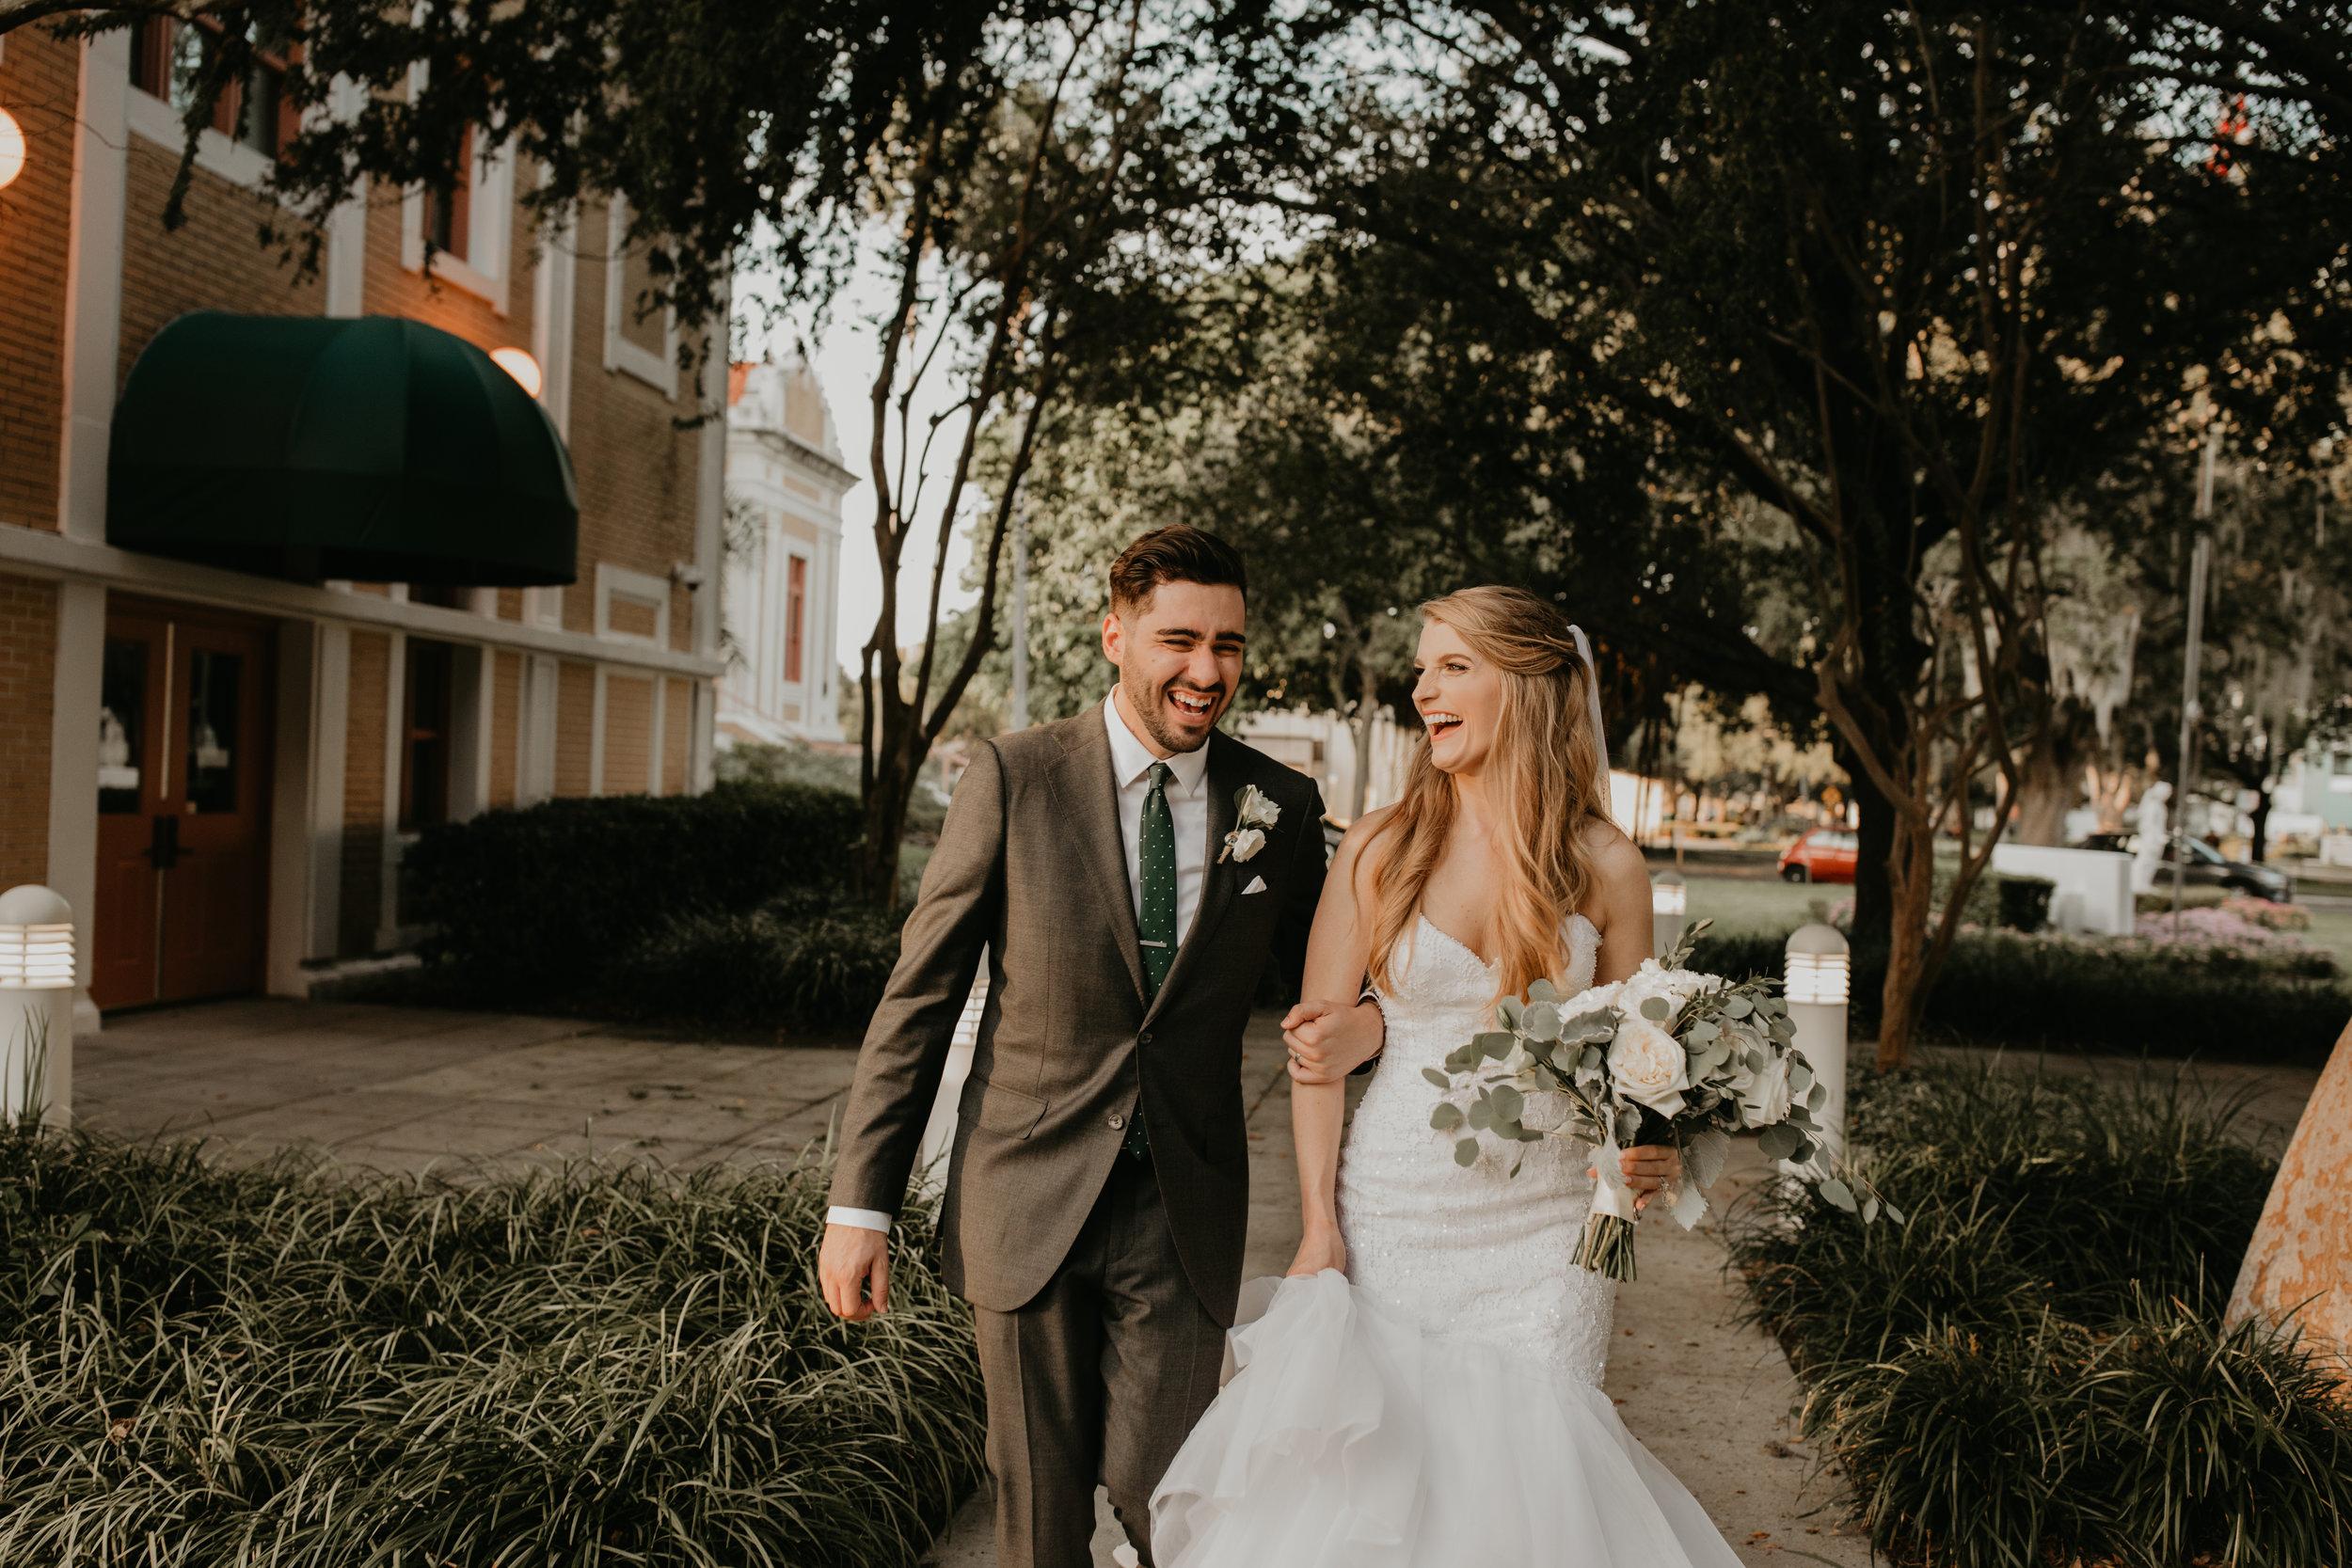 St Petersburg Shuffleboard Club St Petersburg Florida-Wedding- Rachel and Michael76.JPG